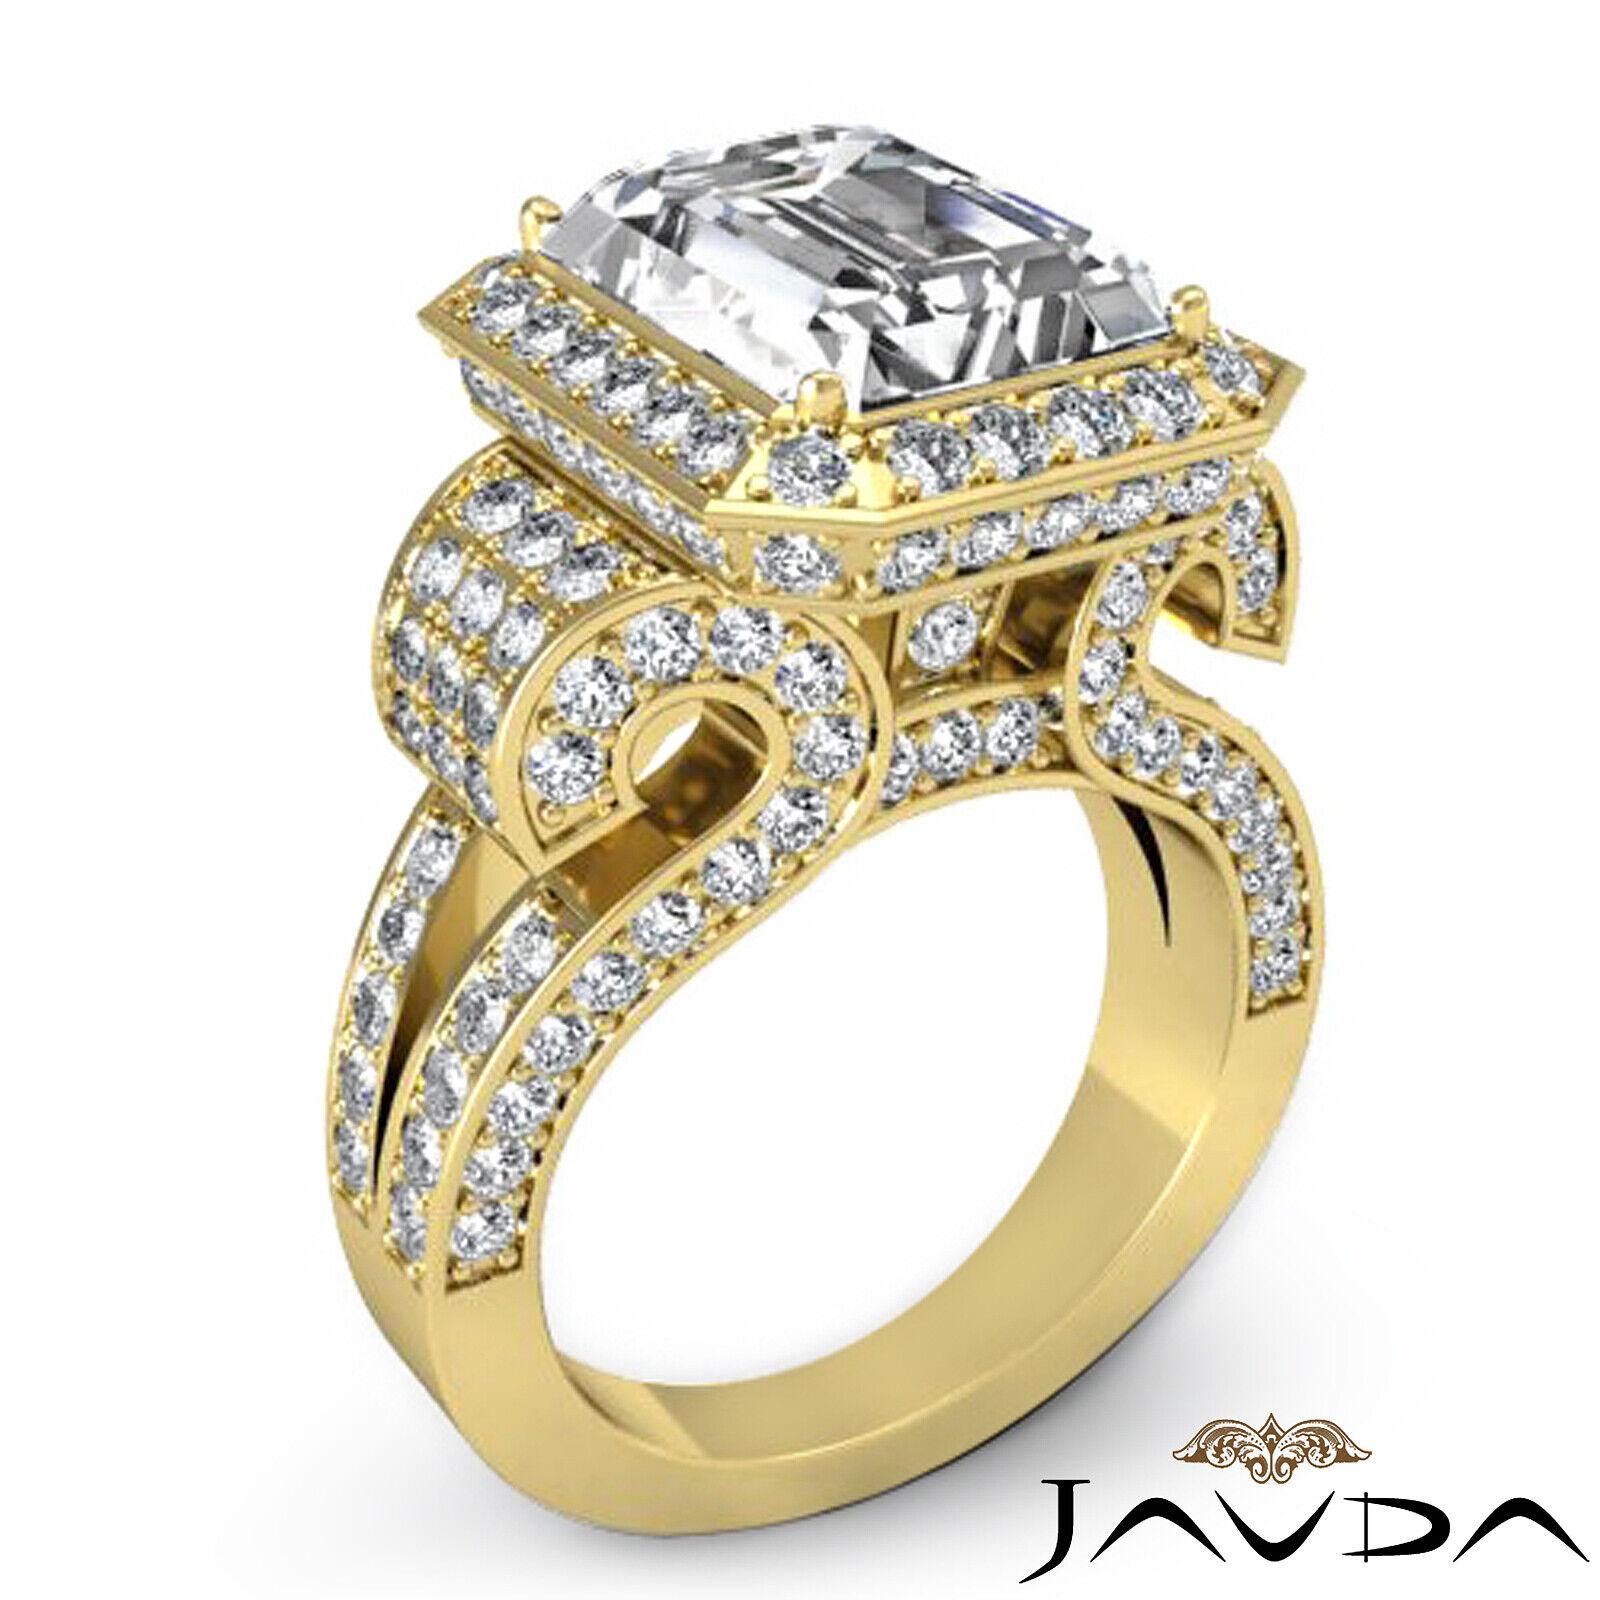 4.4ctw Antique Vintage Halo Emerald Diamond Engagement Ring GIA I-VS1 White Gold 8